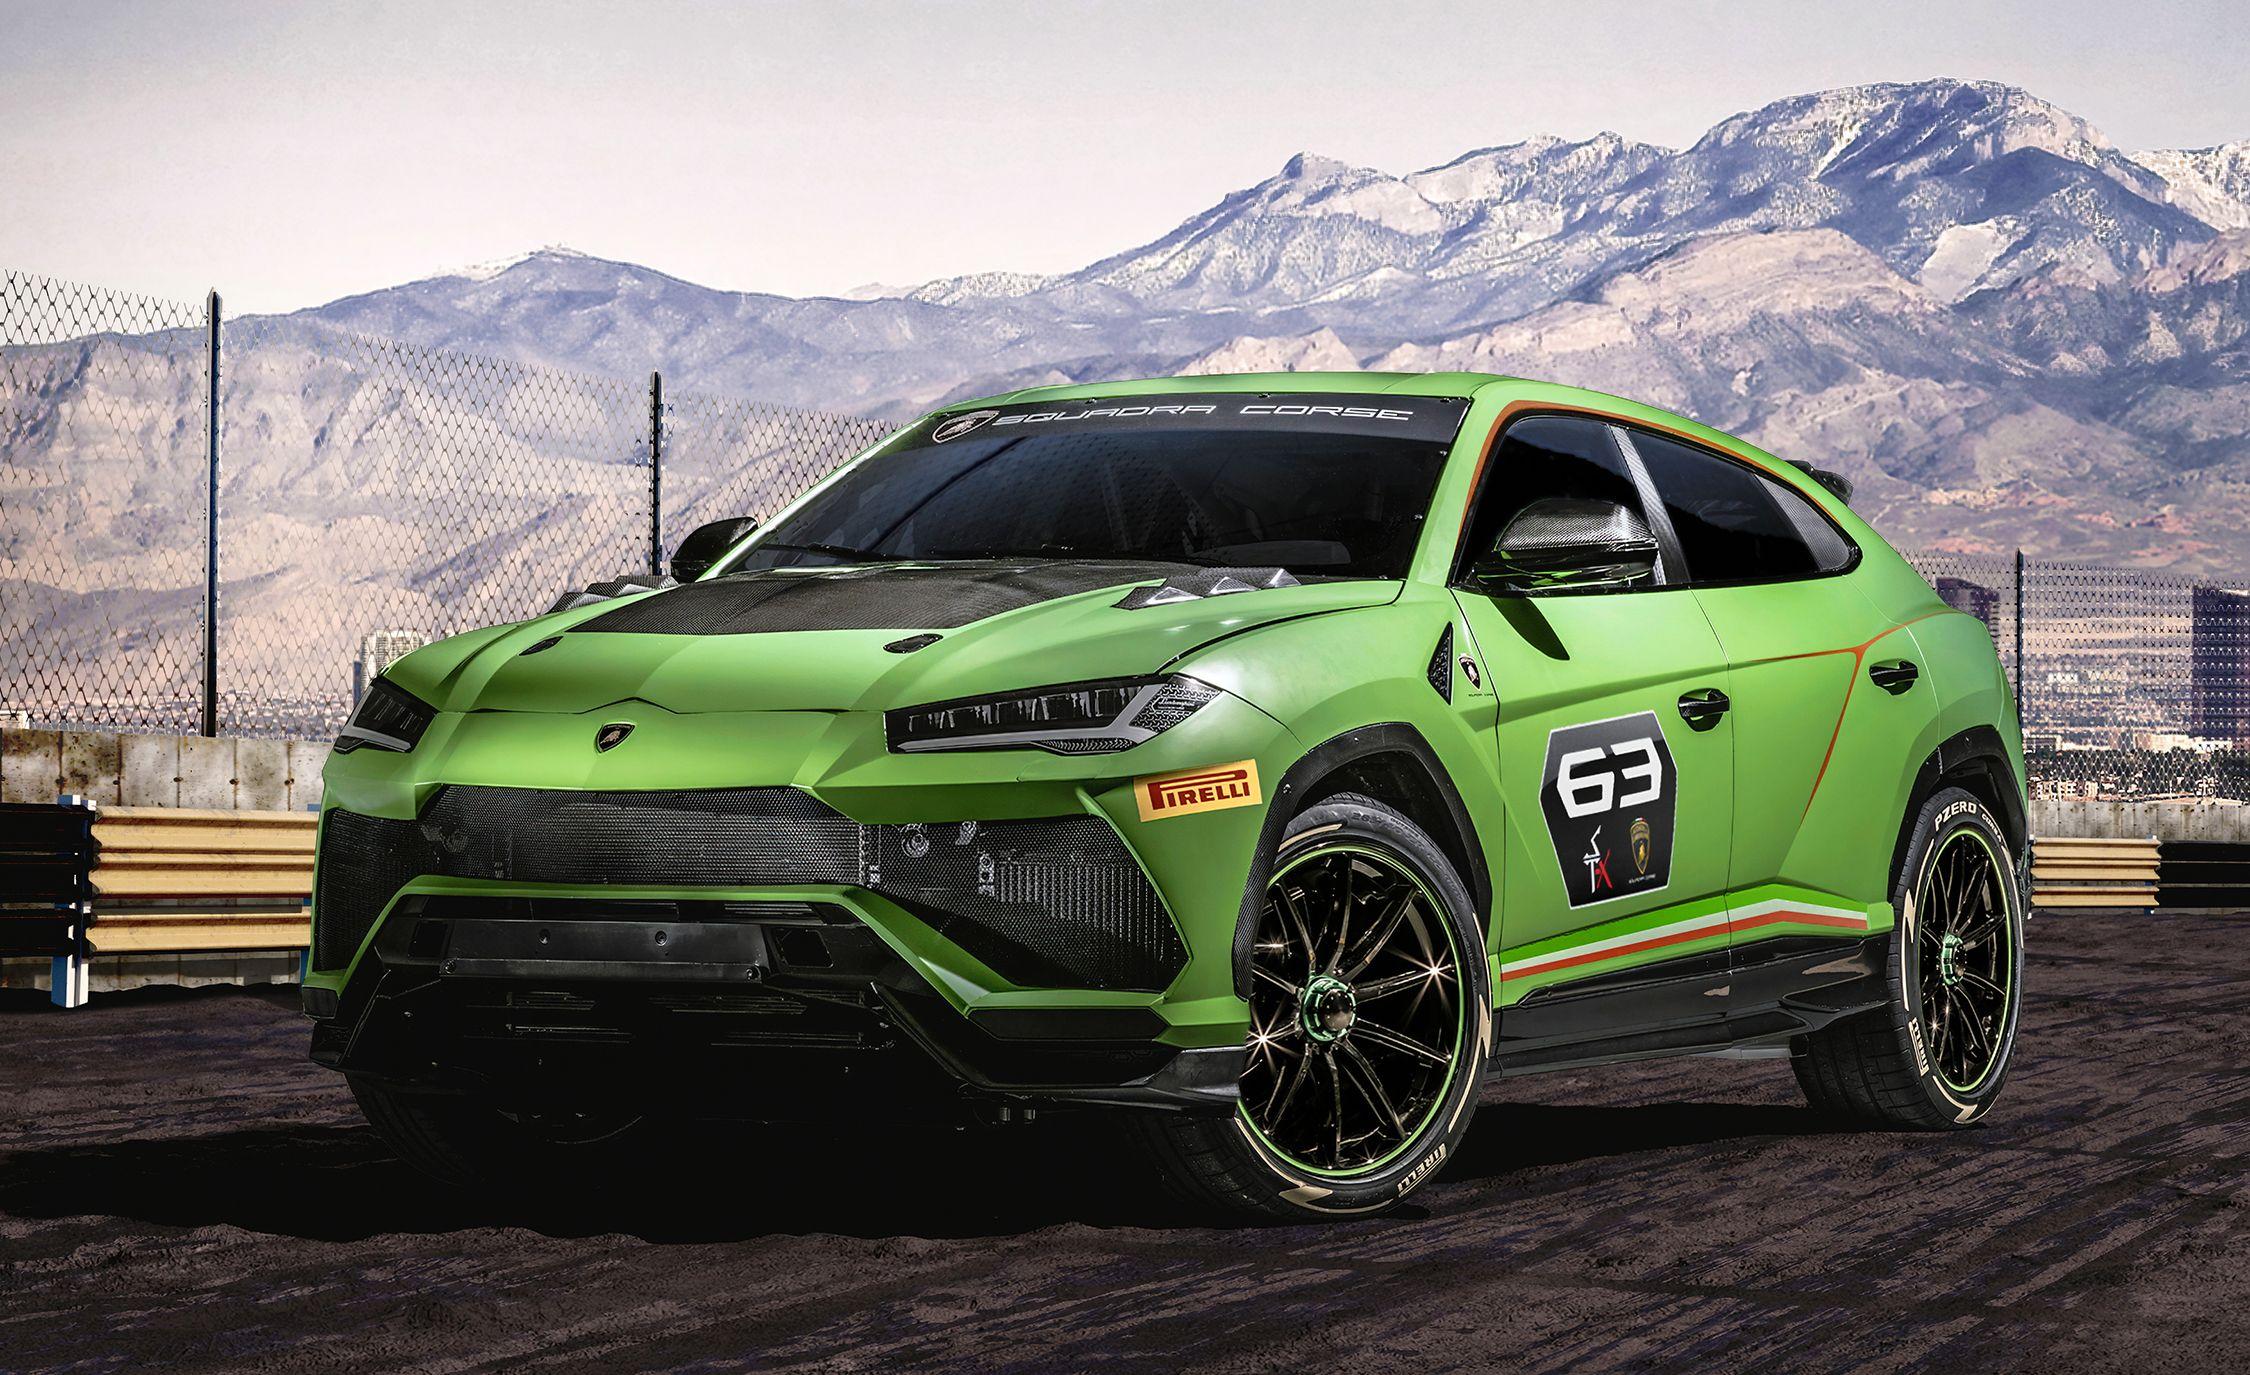 2020 Lamborghini Urus SUV to Hit the Racetrack in 2020